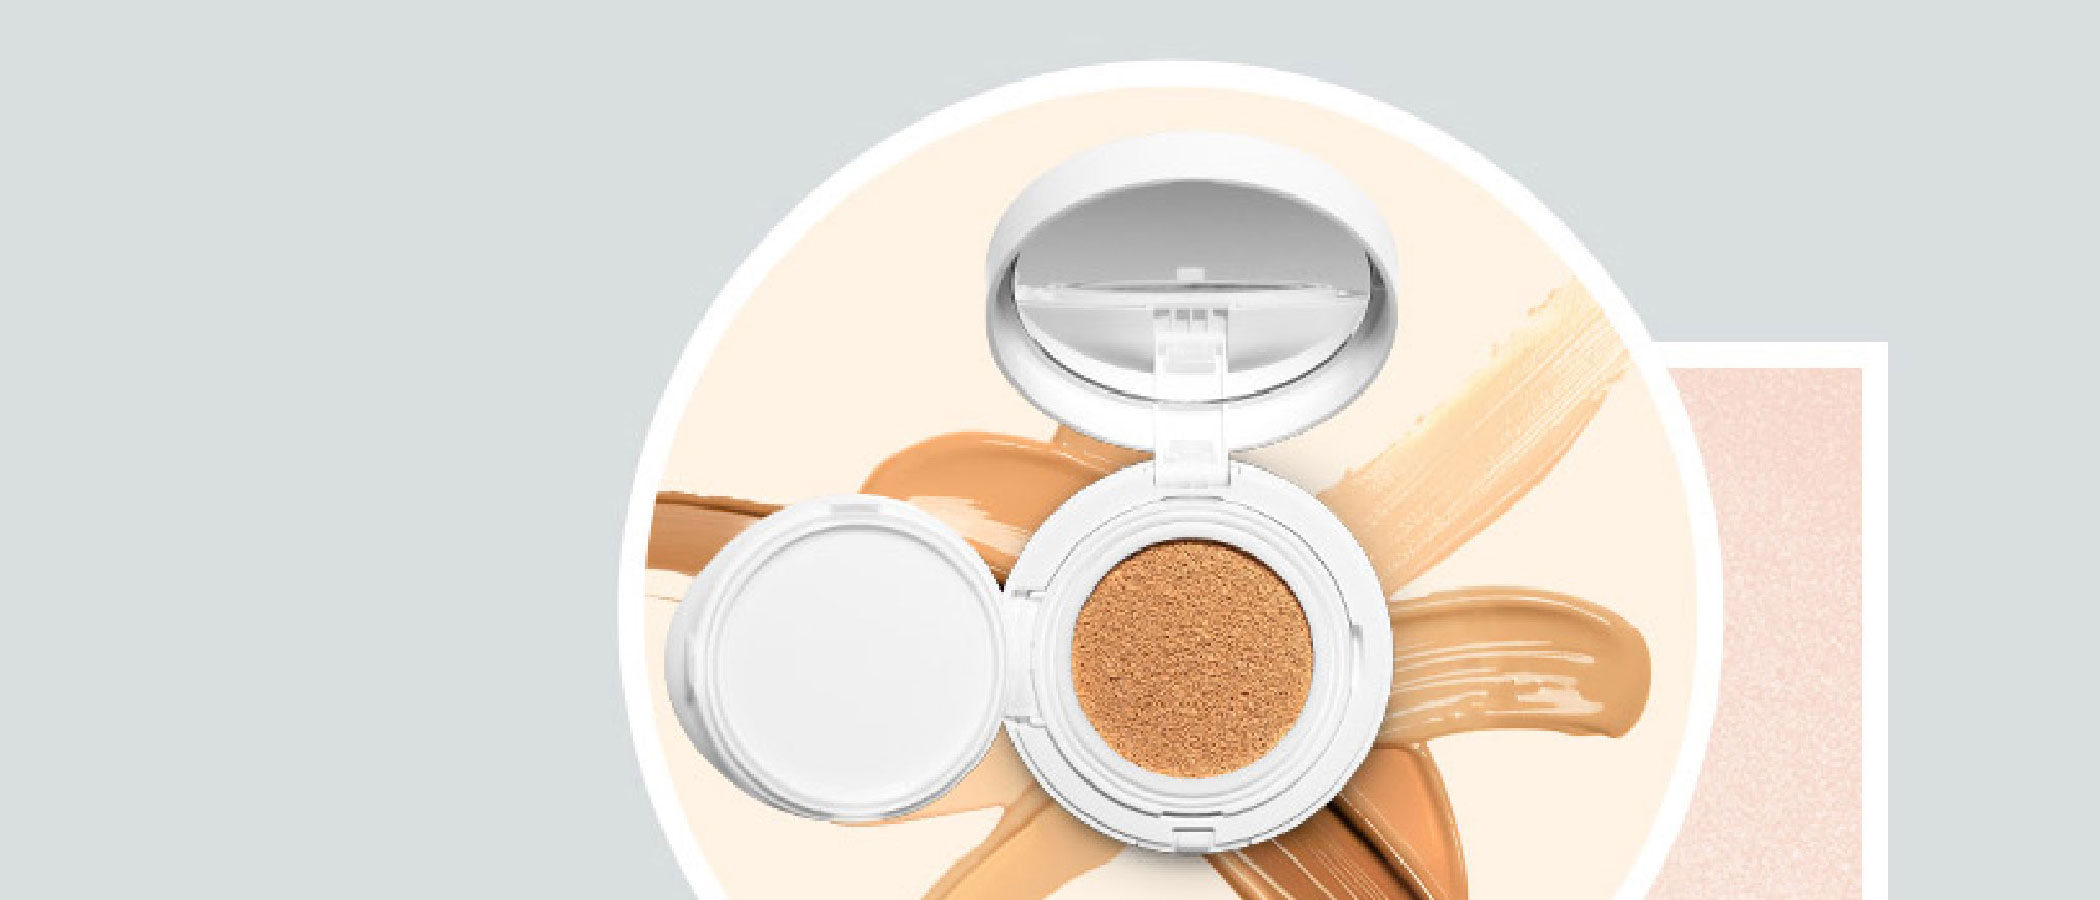 Topshop se suma al maquillaje cushion con el nuevo 'Aircushion Skin Perfector'